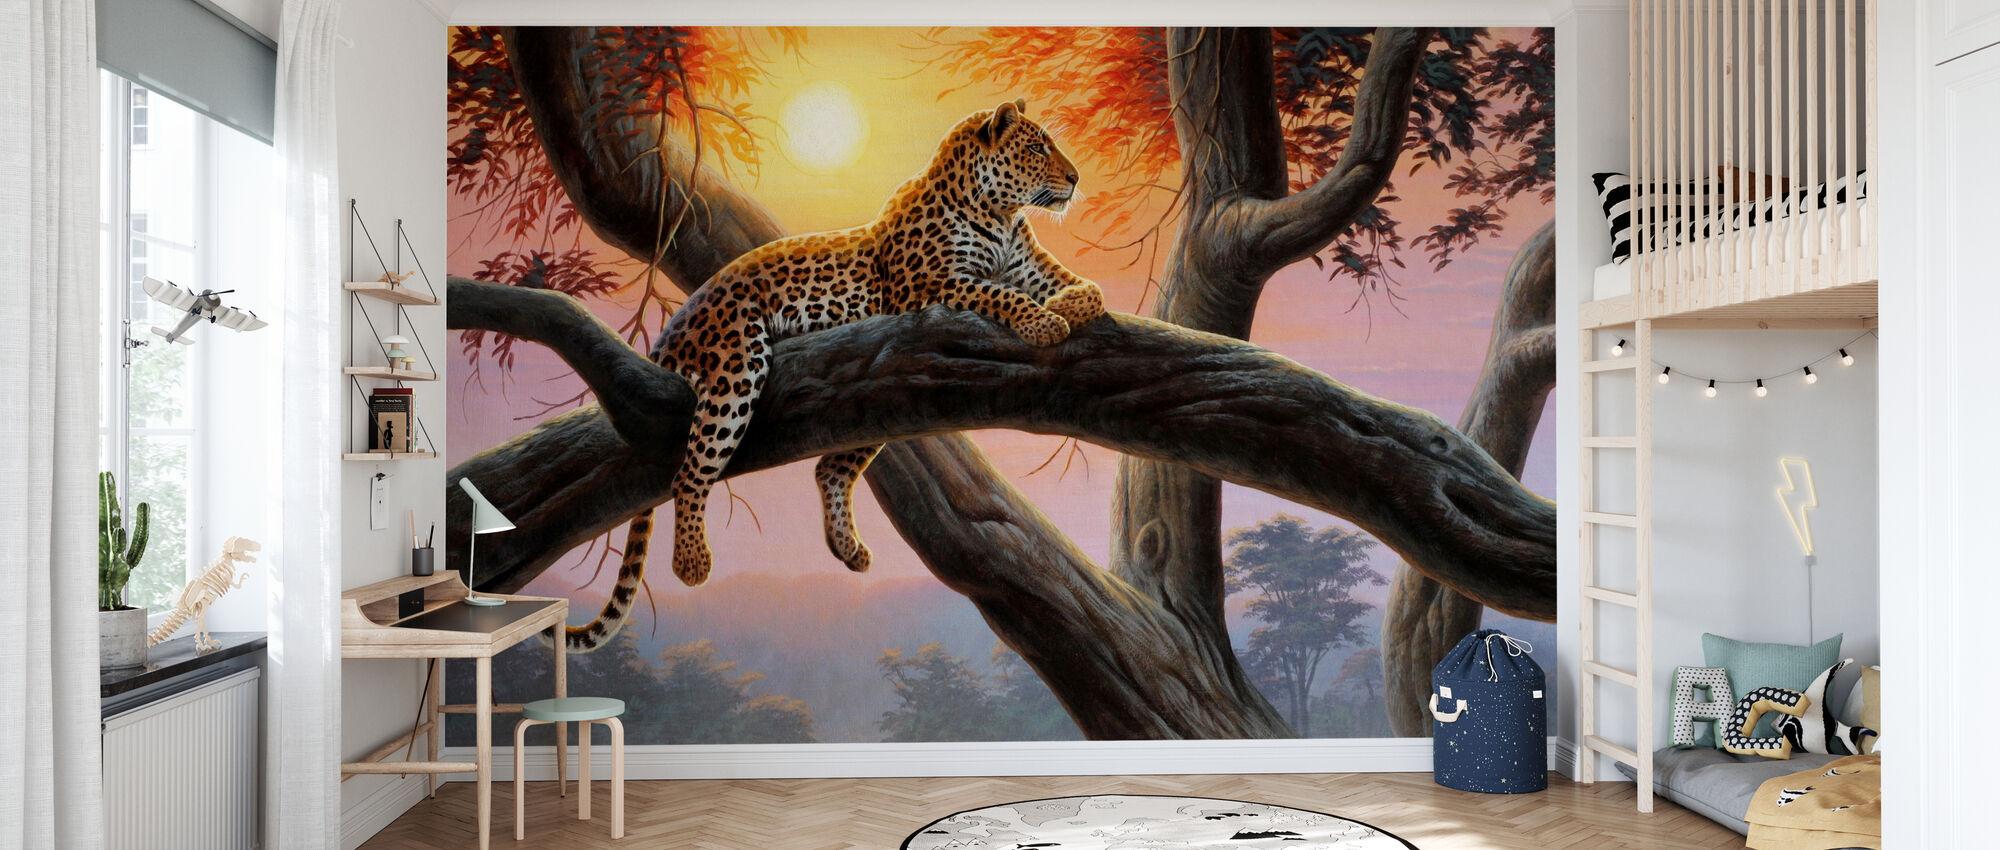 Abenduhr - Leopard - Tapete - Kinderzimmer